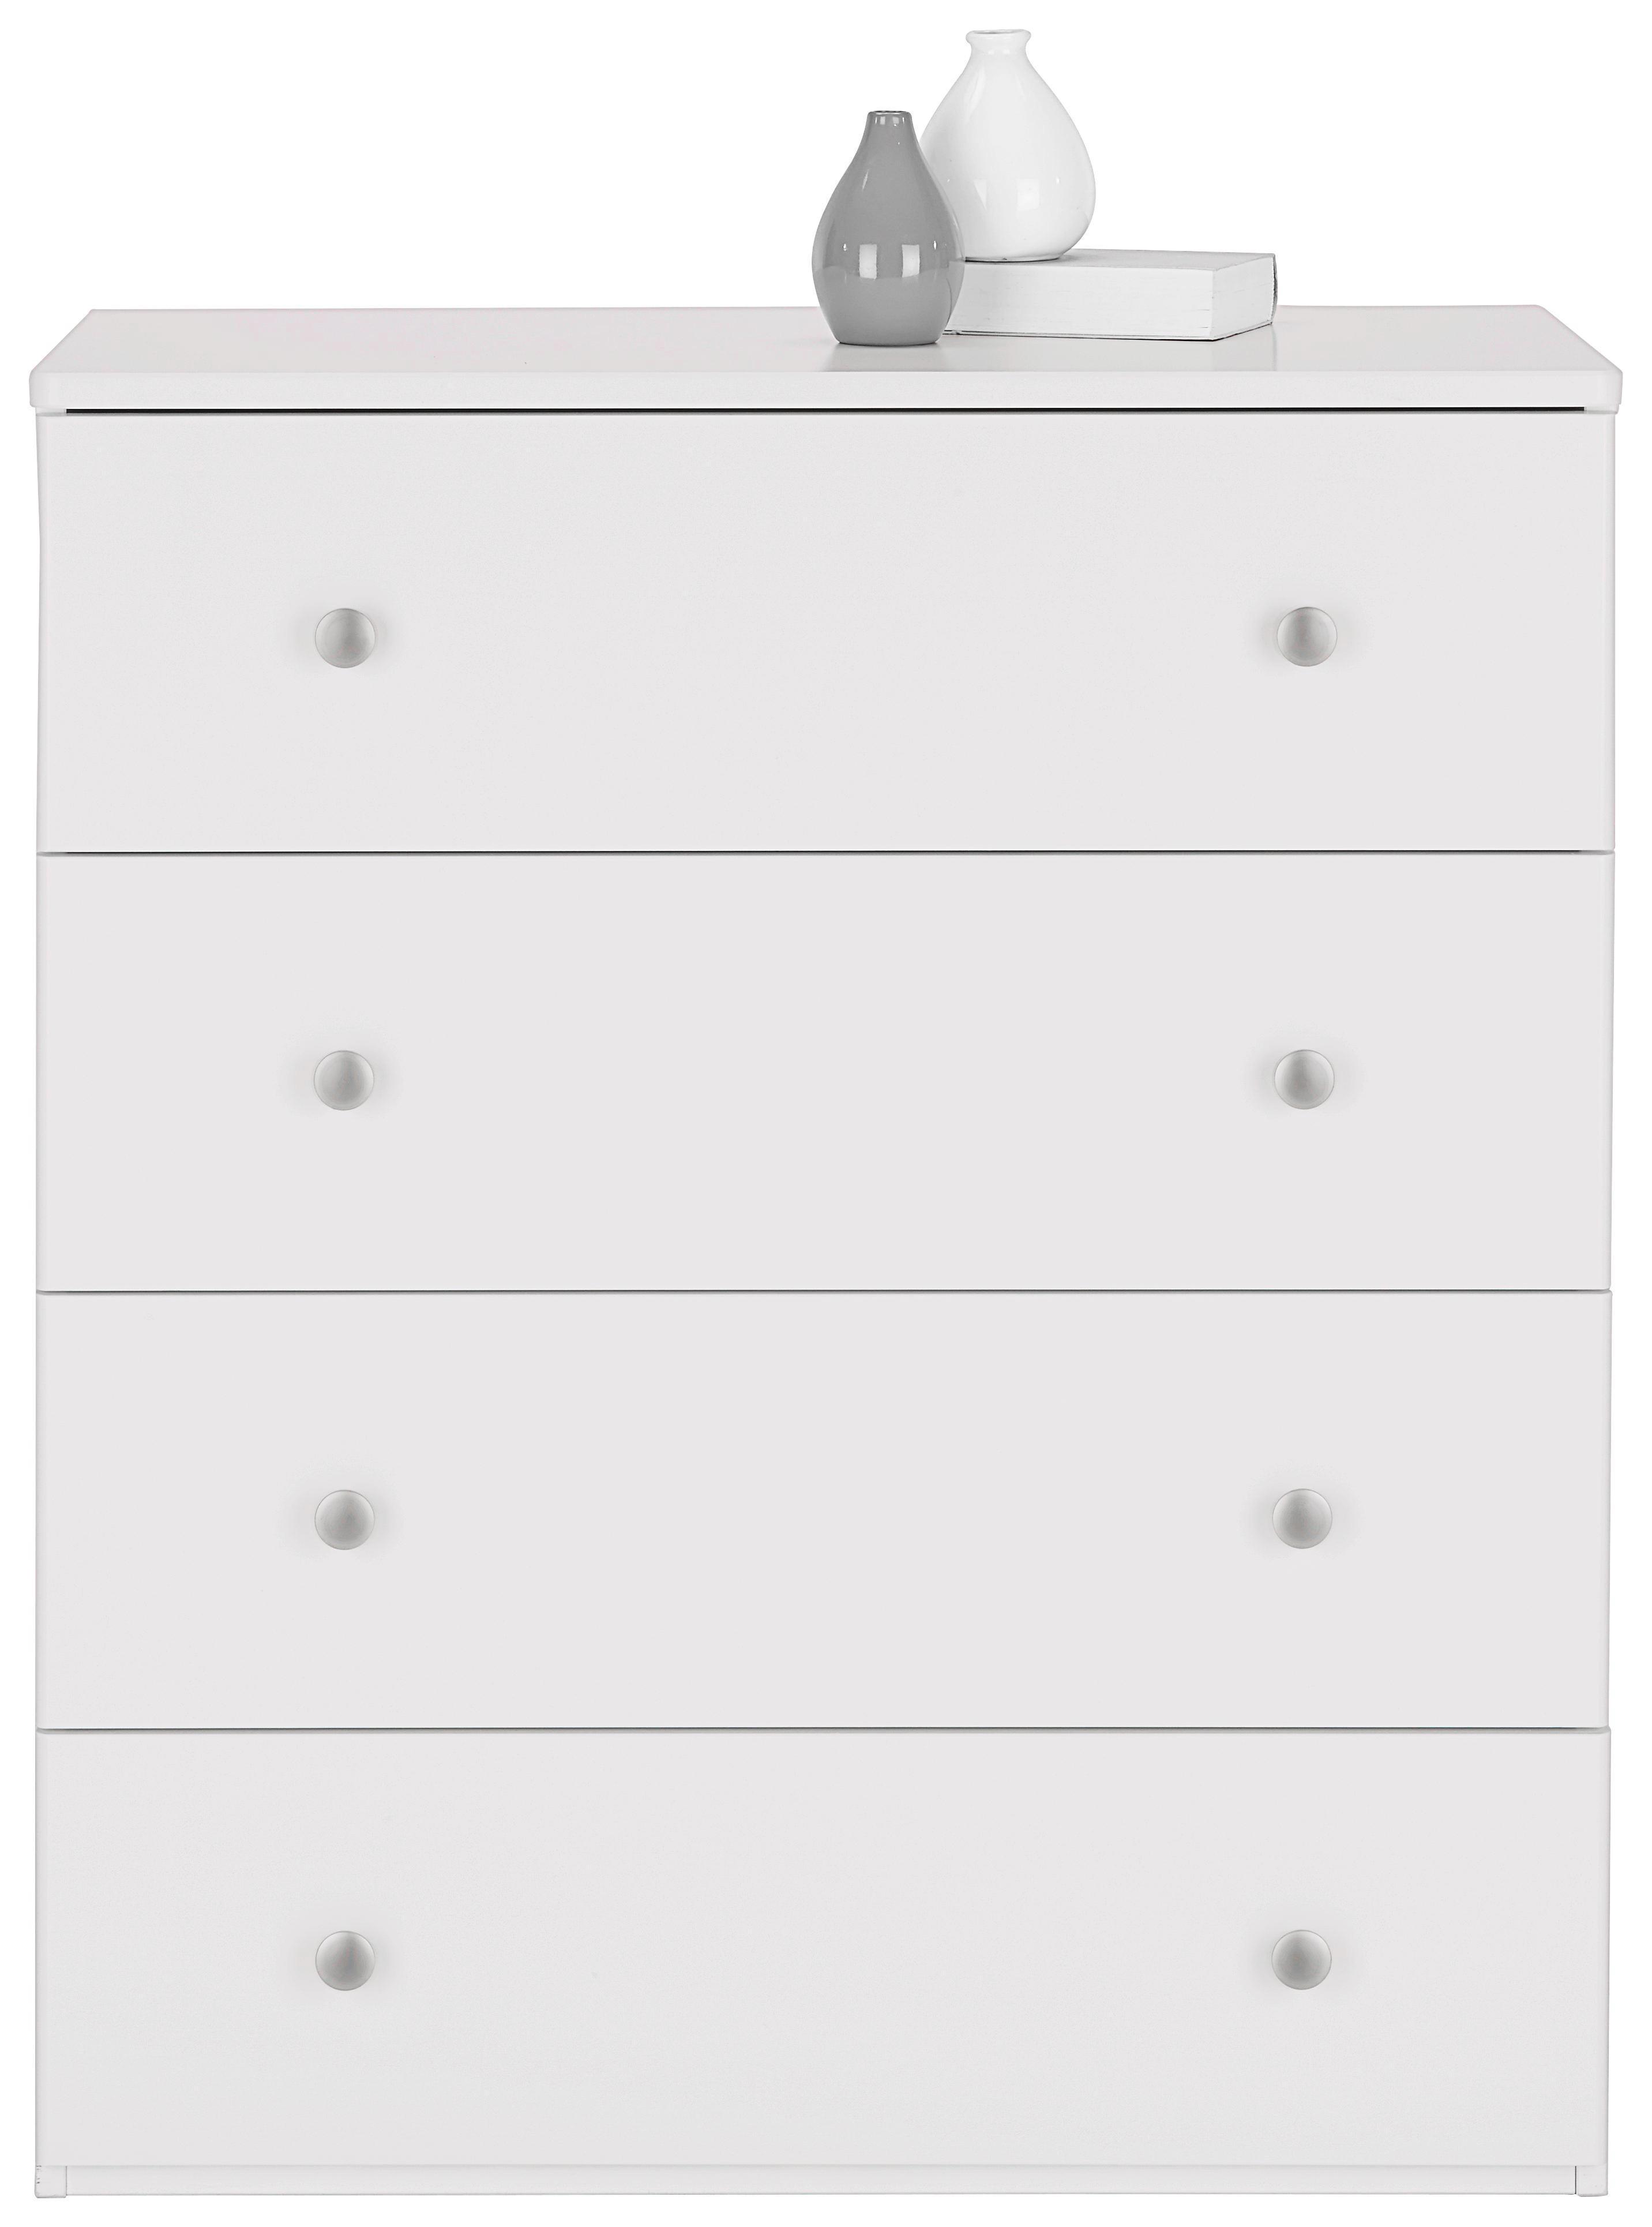 Kommode in Weiß - Silberfarben/Weiß, ROMANTIK / LANDHAUS, Holzwerkstoff/Metall (80/92/40cm) - ZANDIARA